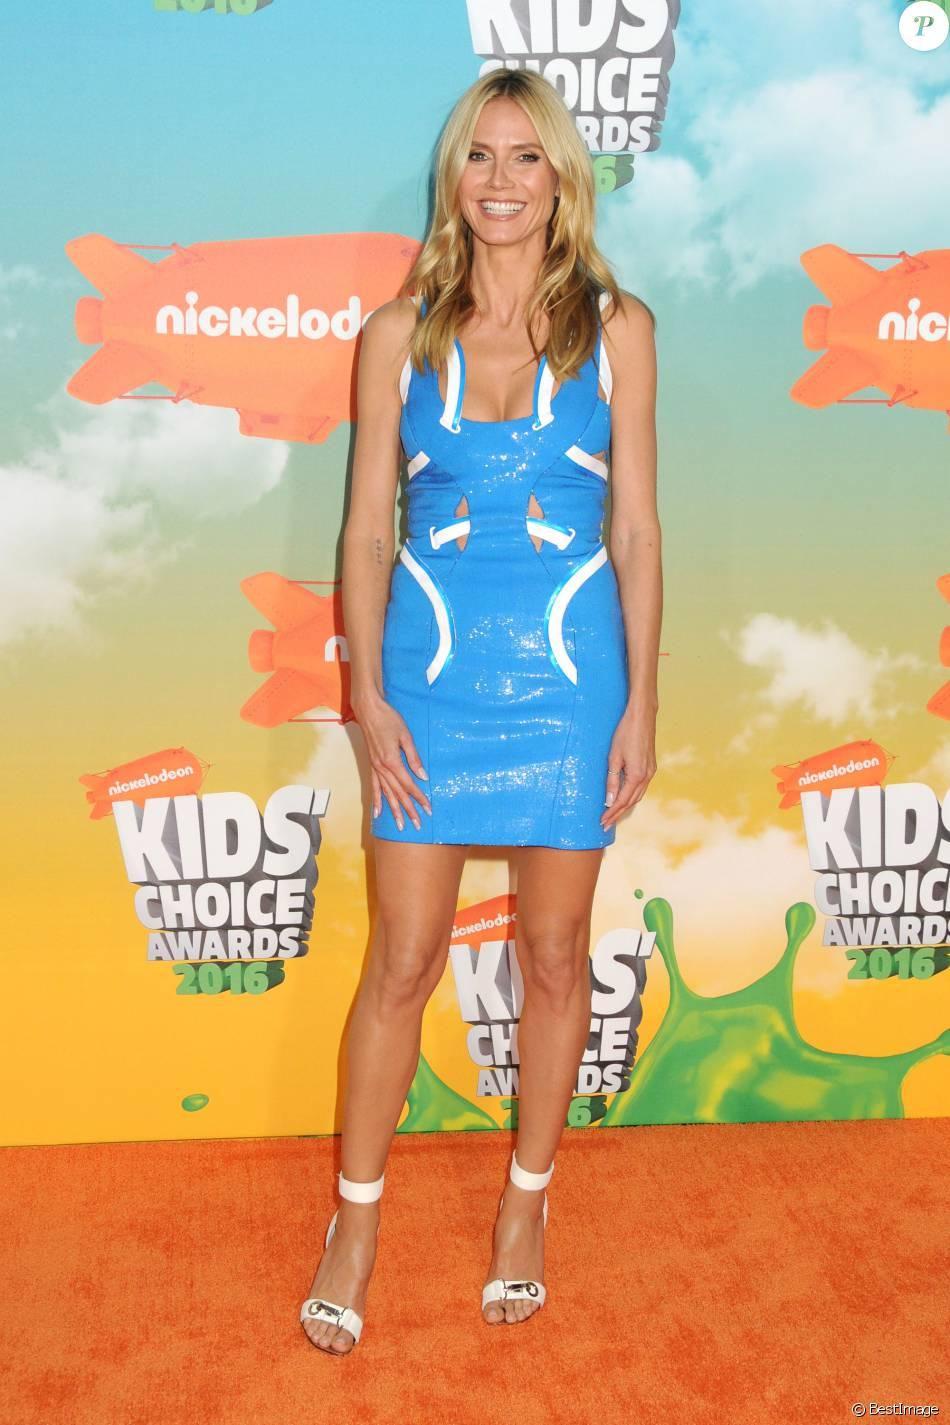 "Heidi Klum - People à la soirée ""Kids' Choice Awards"" au Forum à Inglewood. Le 12 mars 2016"